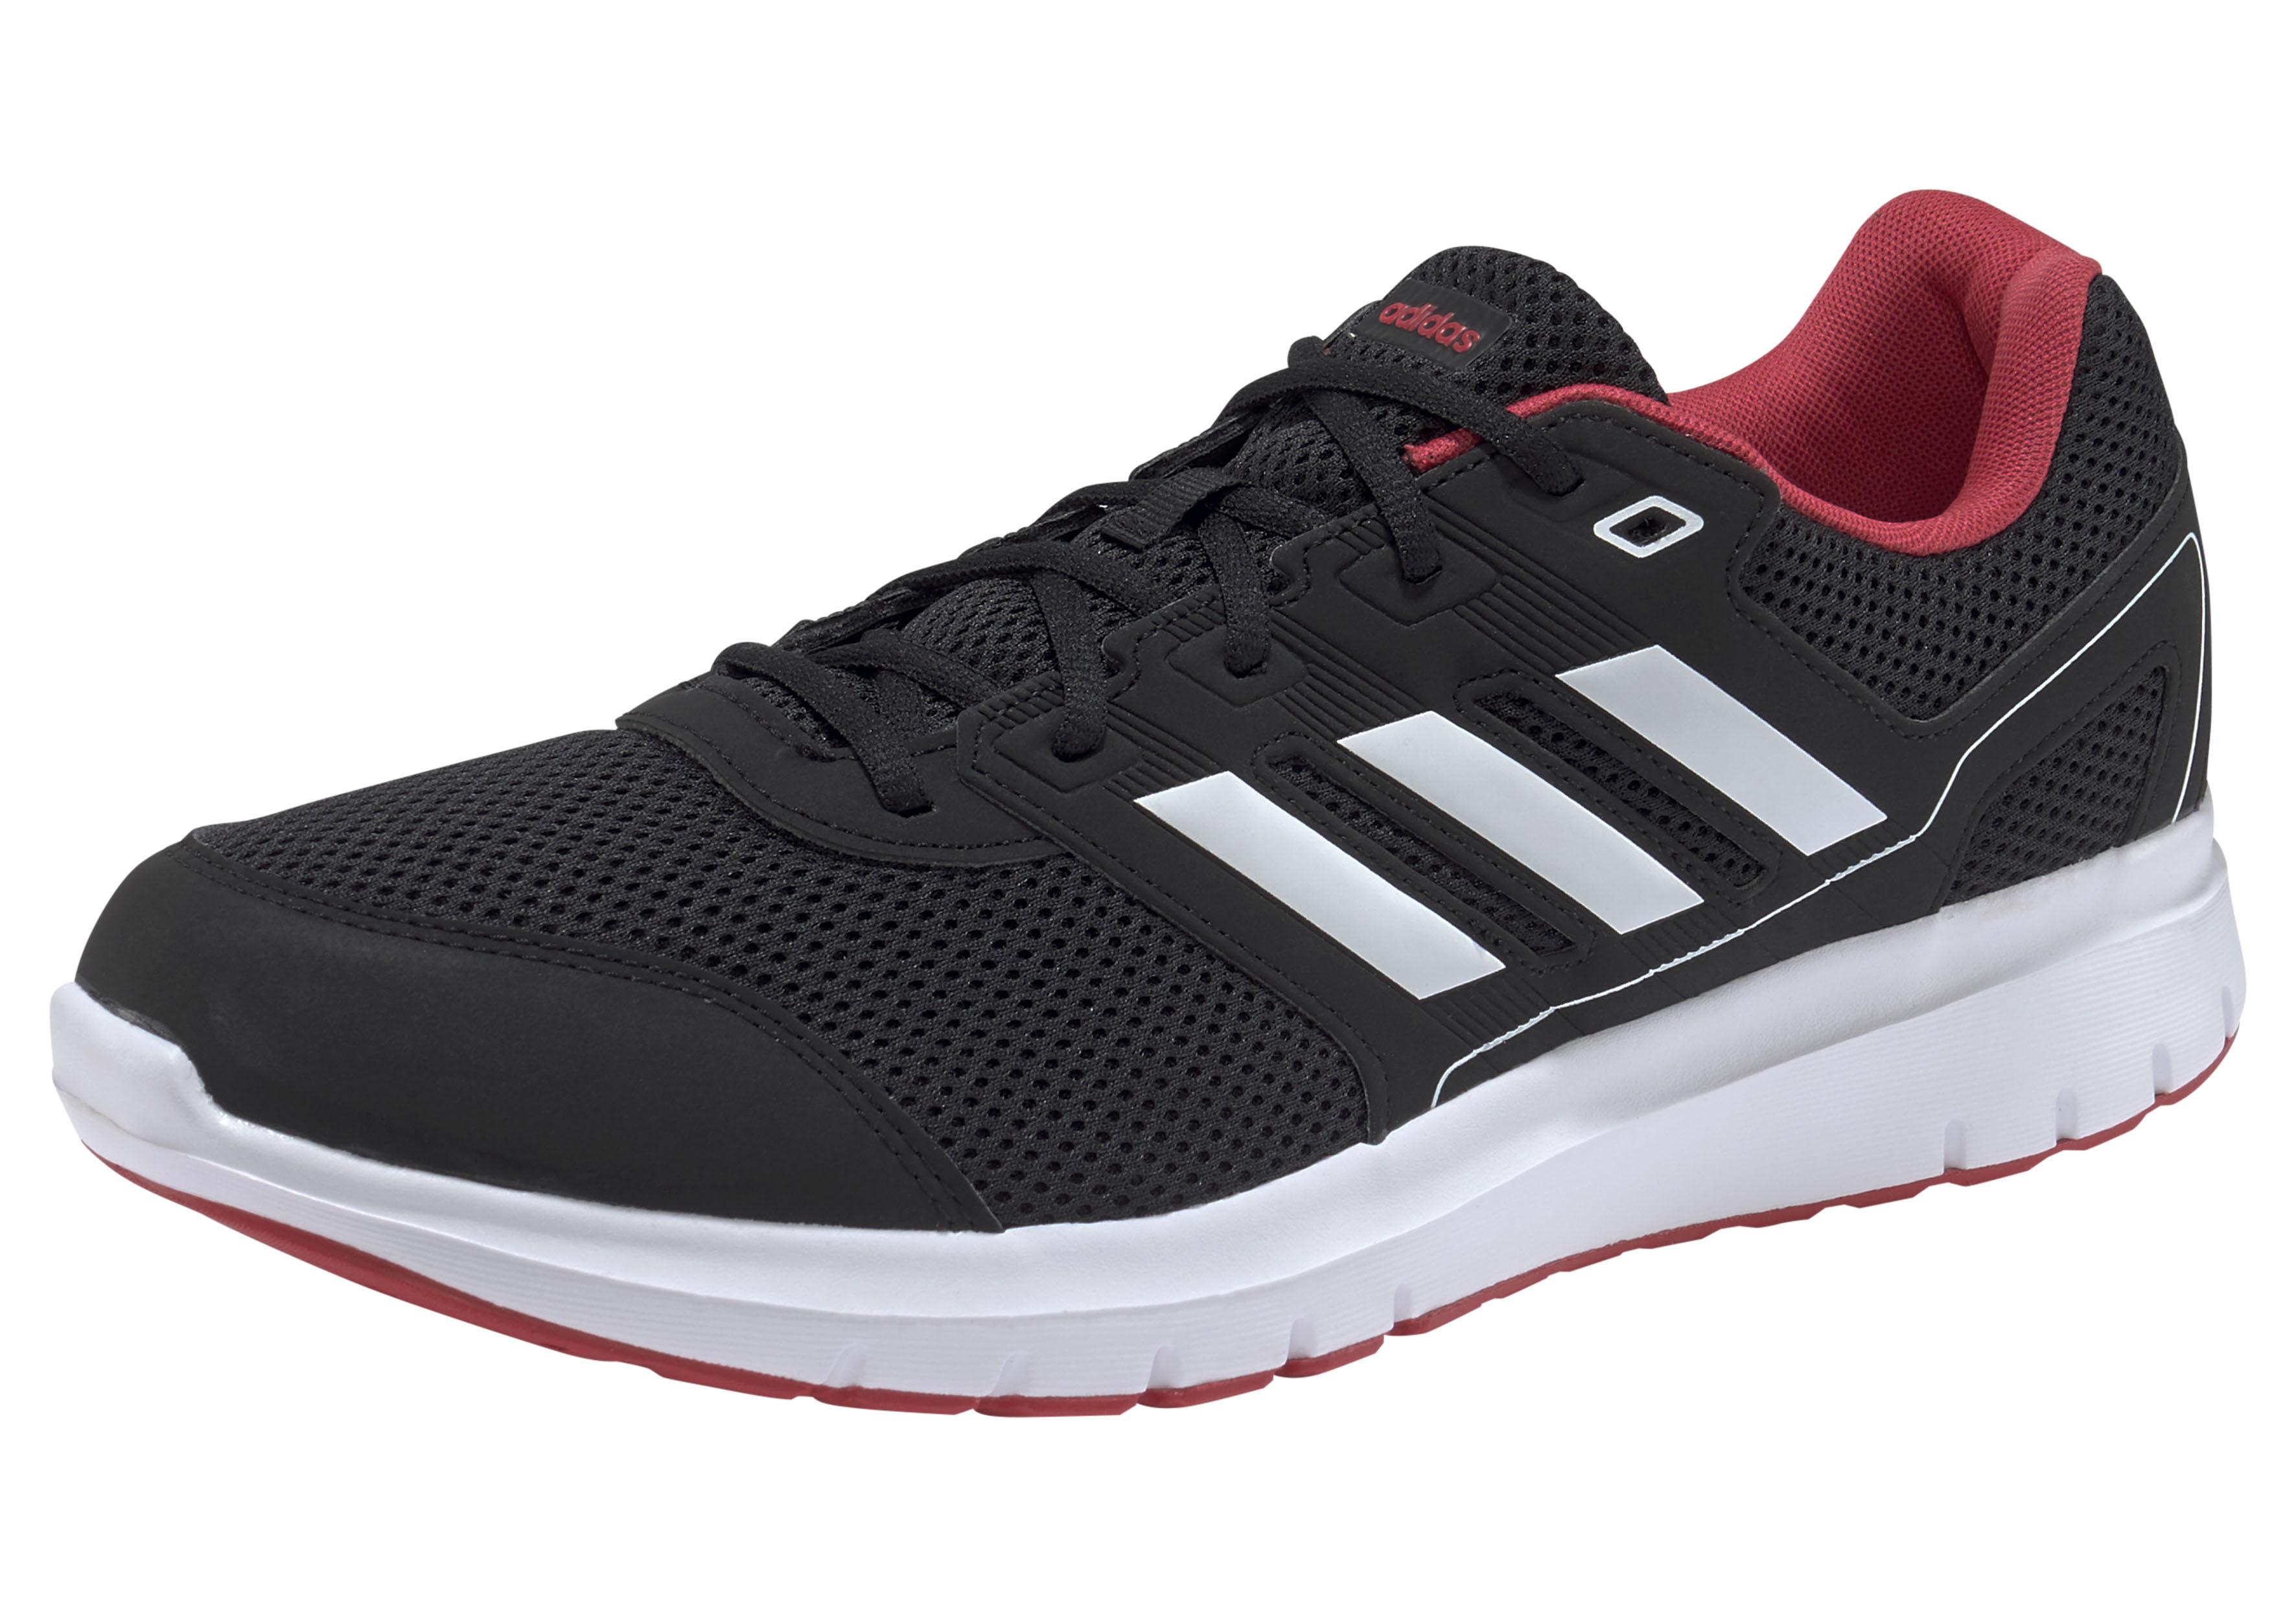 adidas Performance Laufschuh DURAMO LITE 2.0 schwarz Laufschuhe Herren Sportschuhe Schuhe Unisex